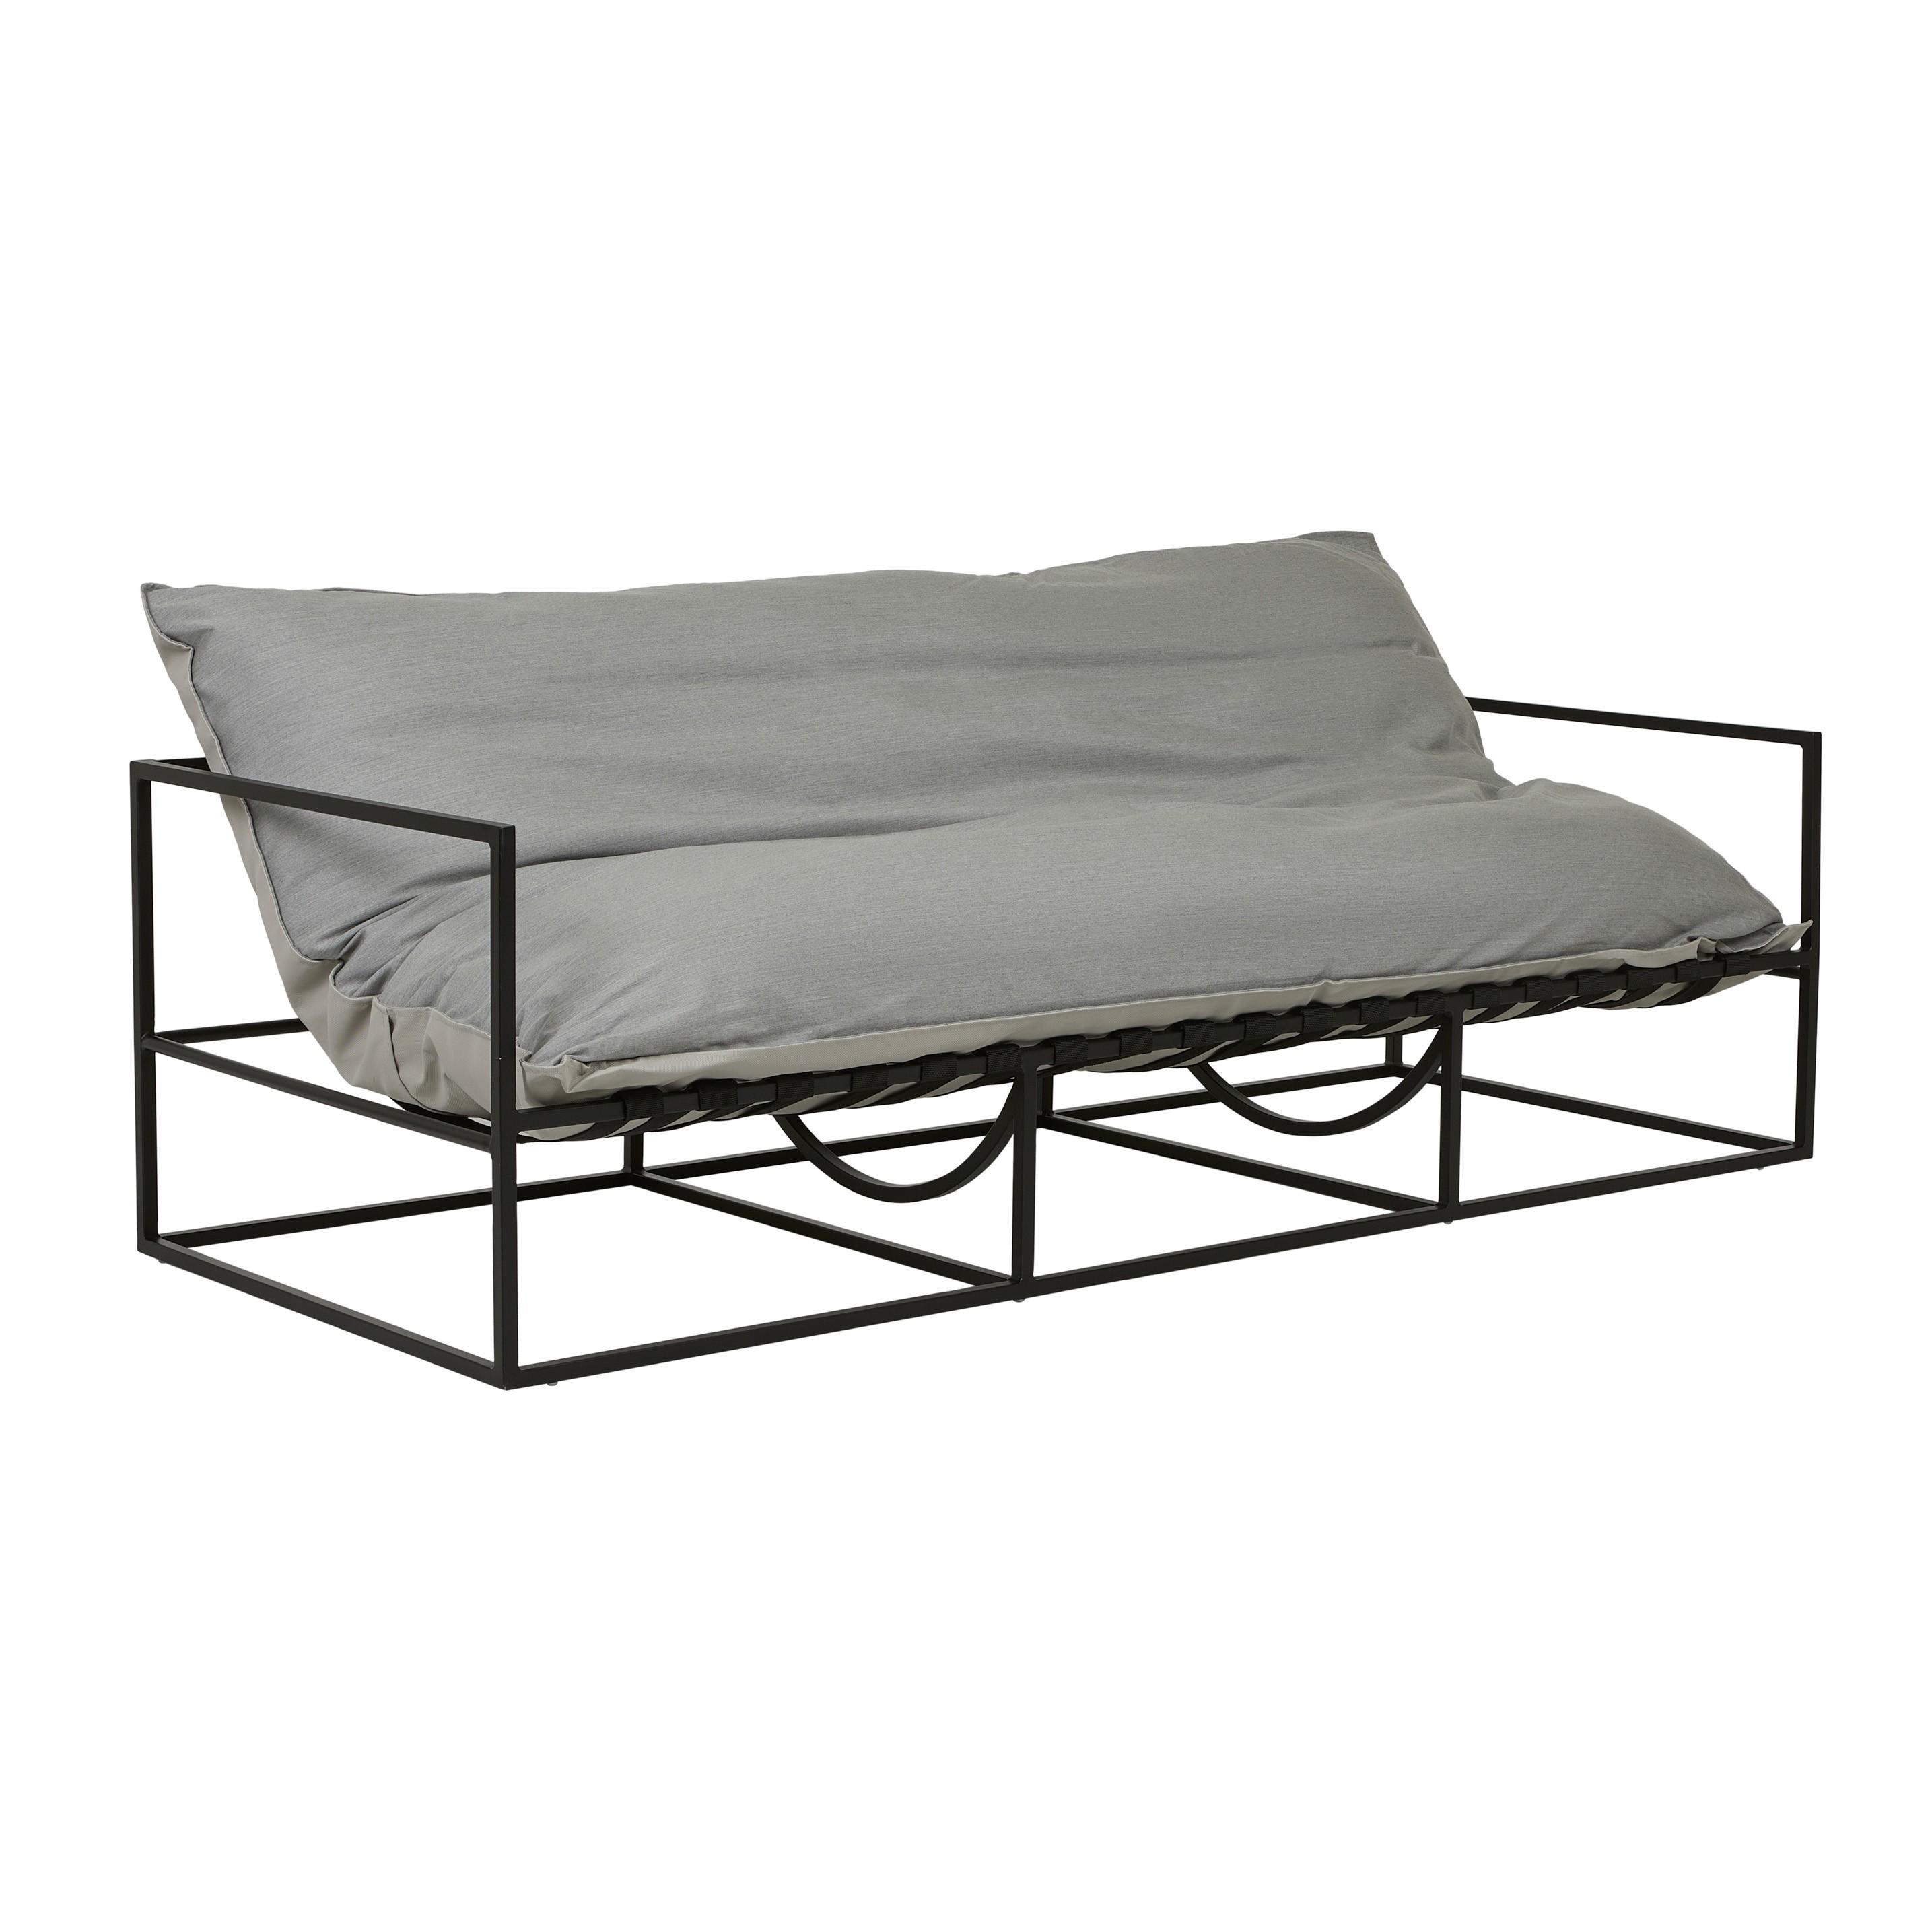 Furniture Hero-Images Sofas aruba-frame-two-seater-02